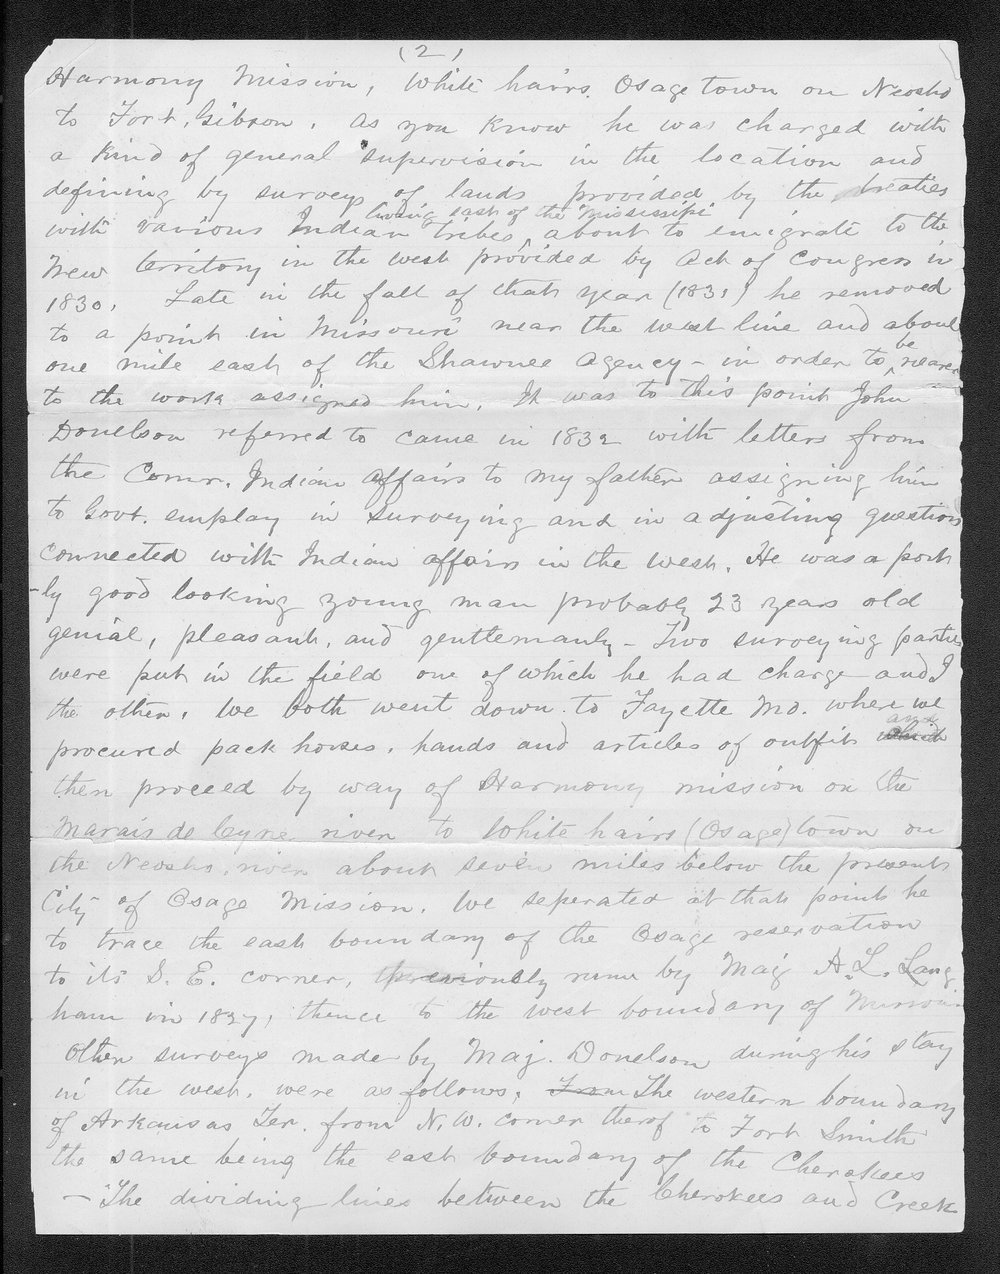 John C. McCoy to Franklin G. Adams - 2